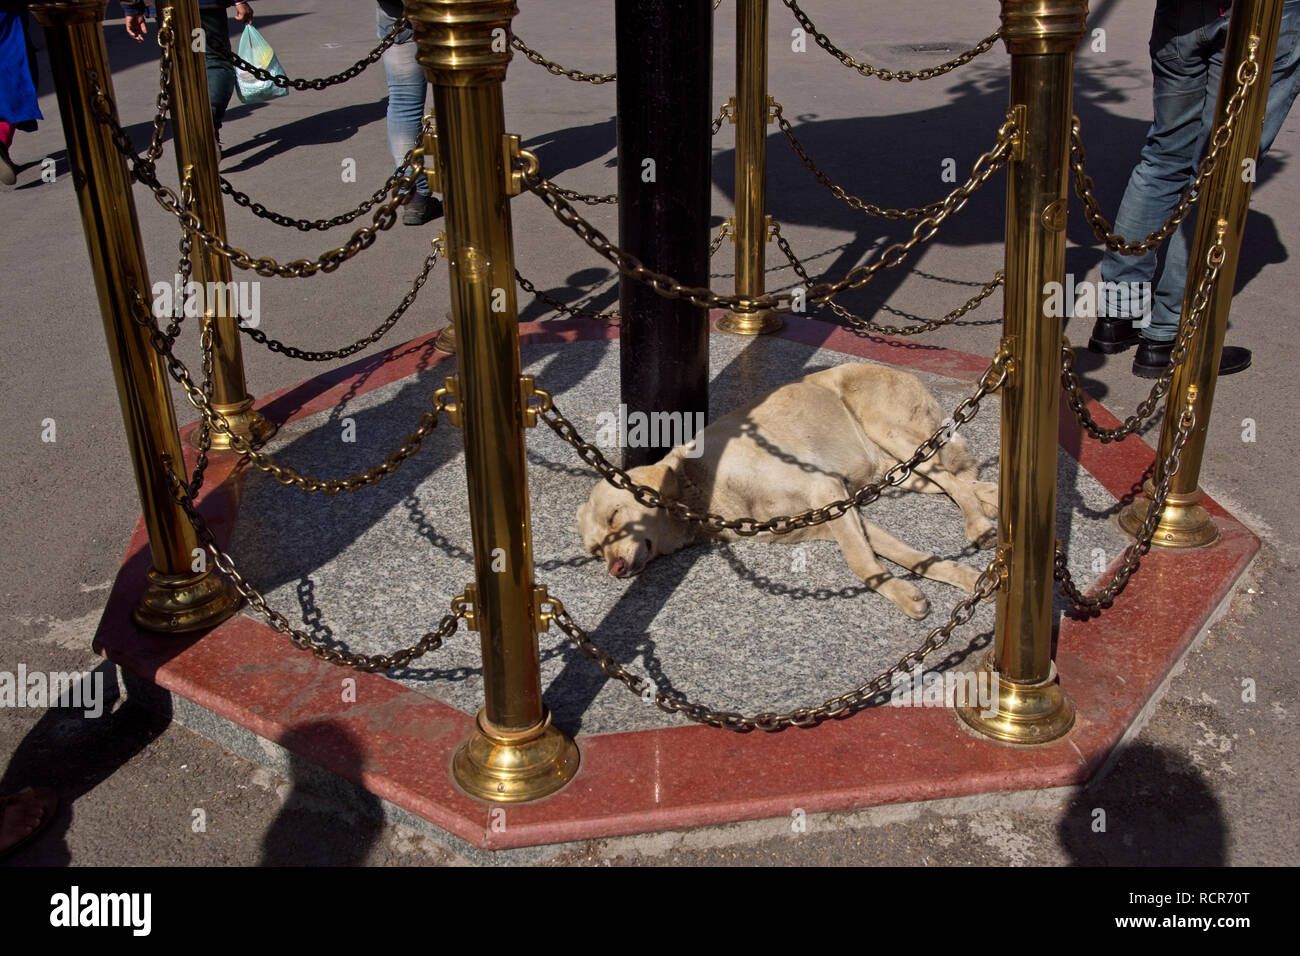 Taking an exotic dog nap. - Stock Image